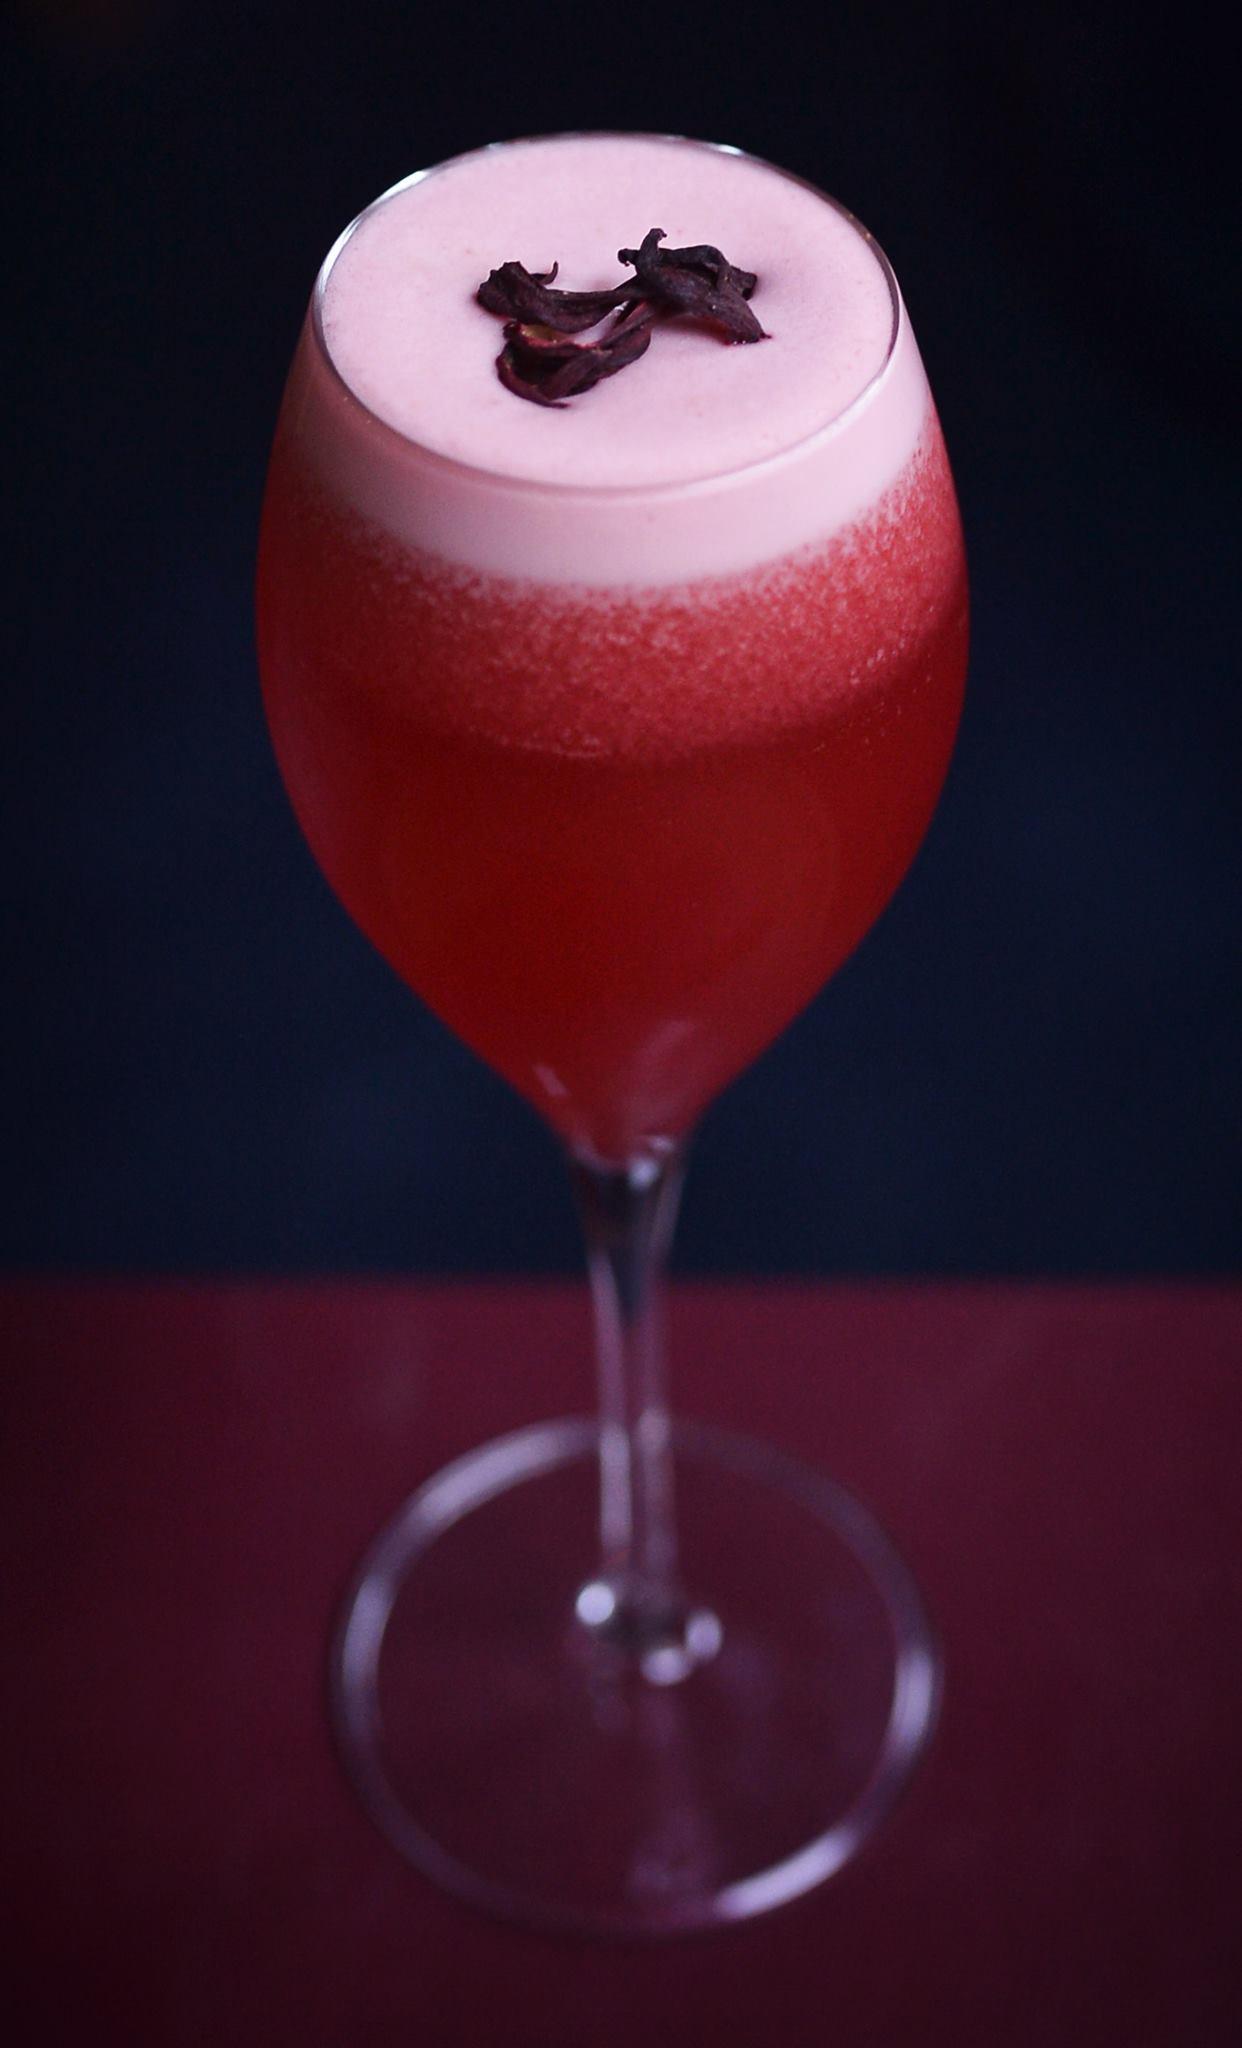 Purple Pokémon - a drink inspired by Kester Thomas by Erwan Lebonniec.